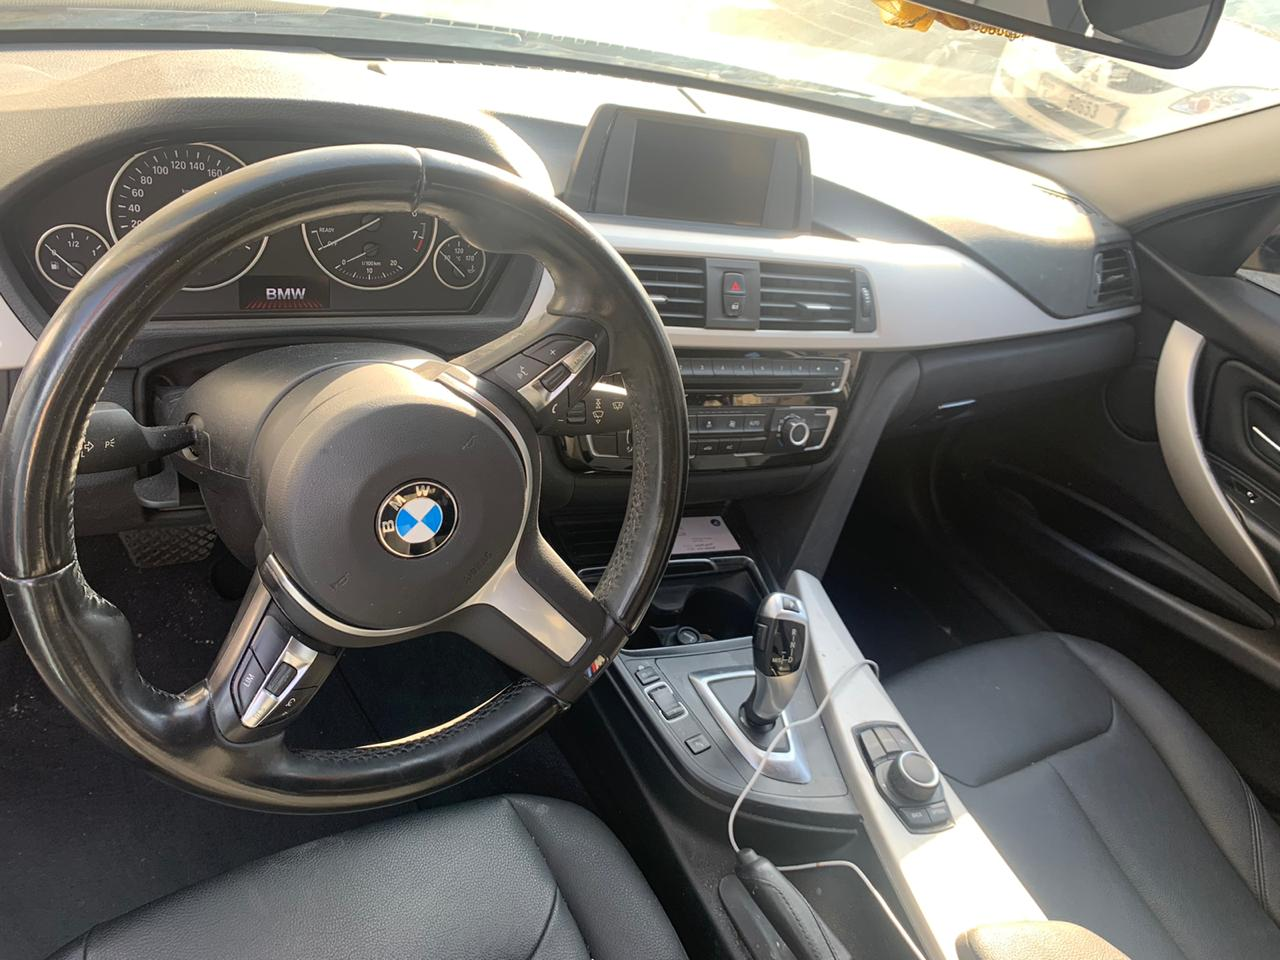 BMW 318i Metal Grey in Dubai - Image 1